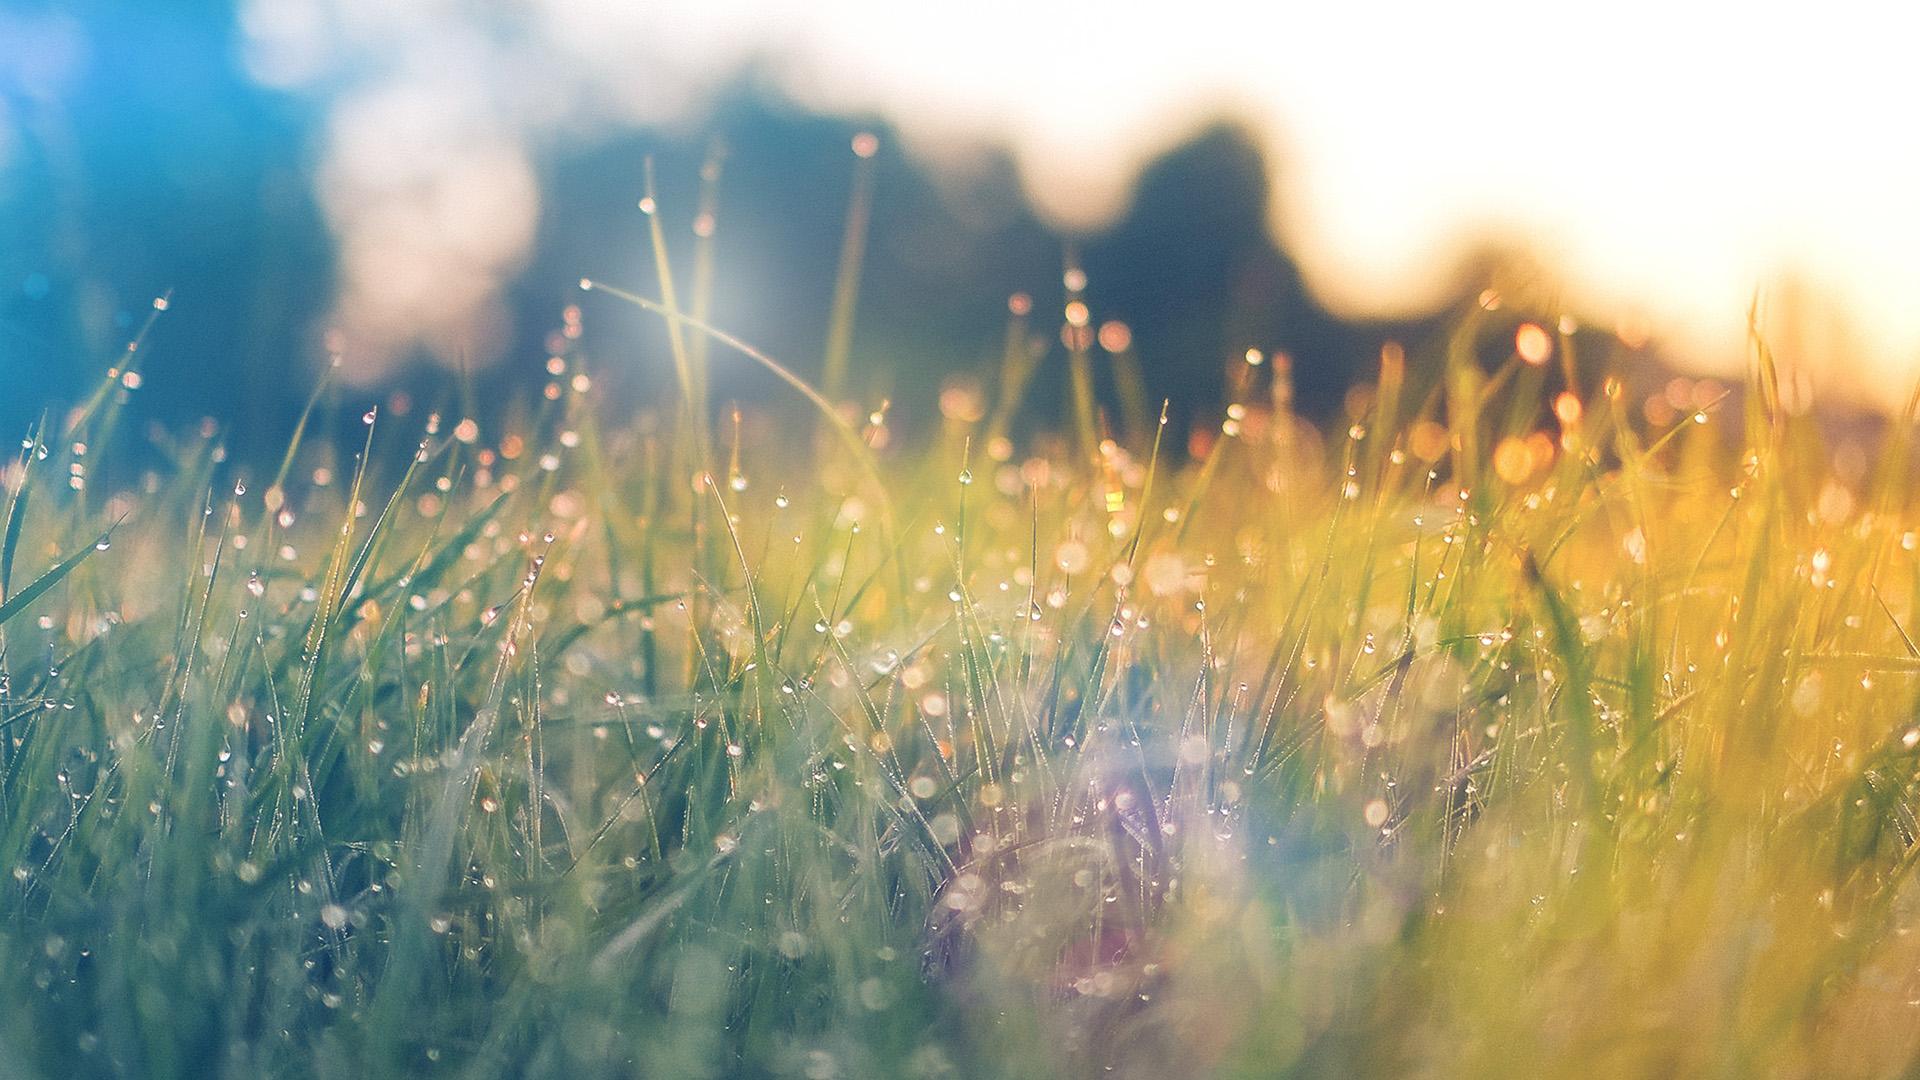 nm68-lawn-green-nature-sunset-light-bokeh-spring-flare ...